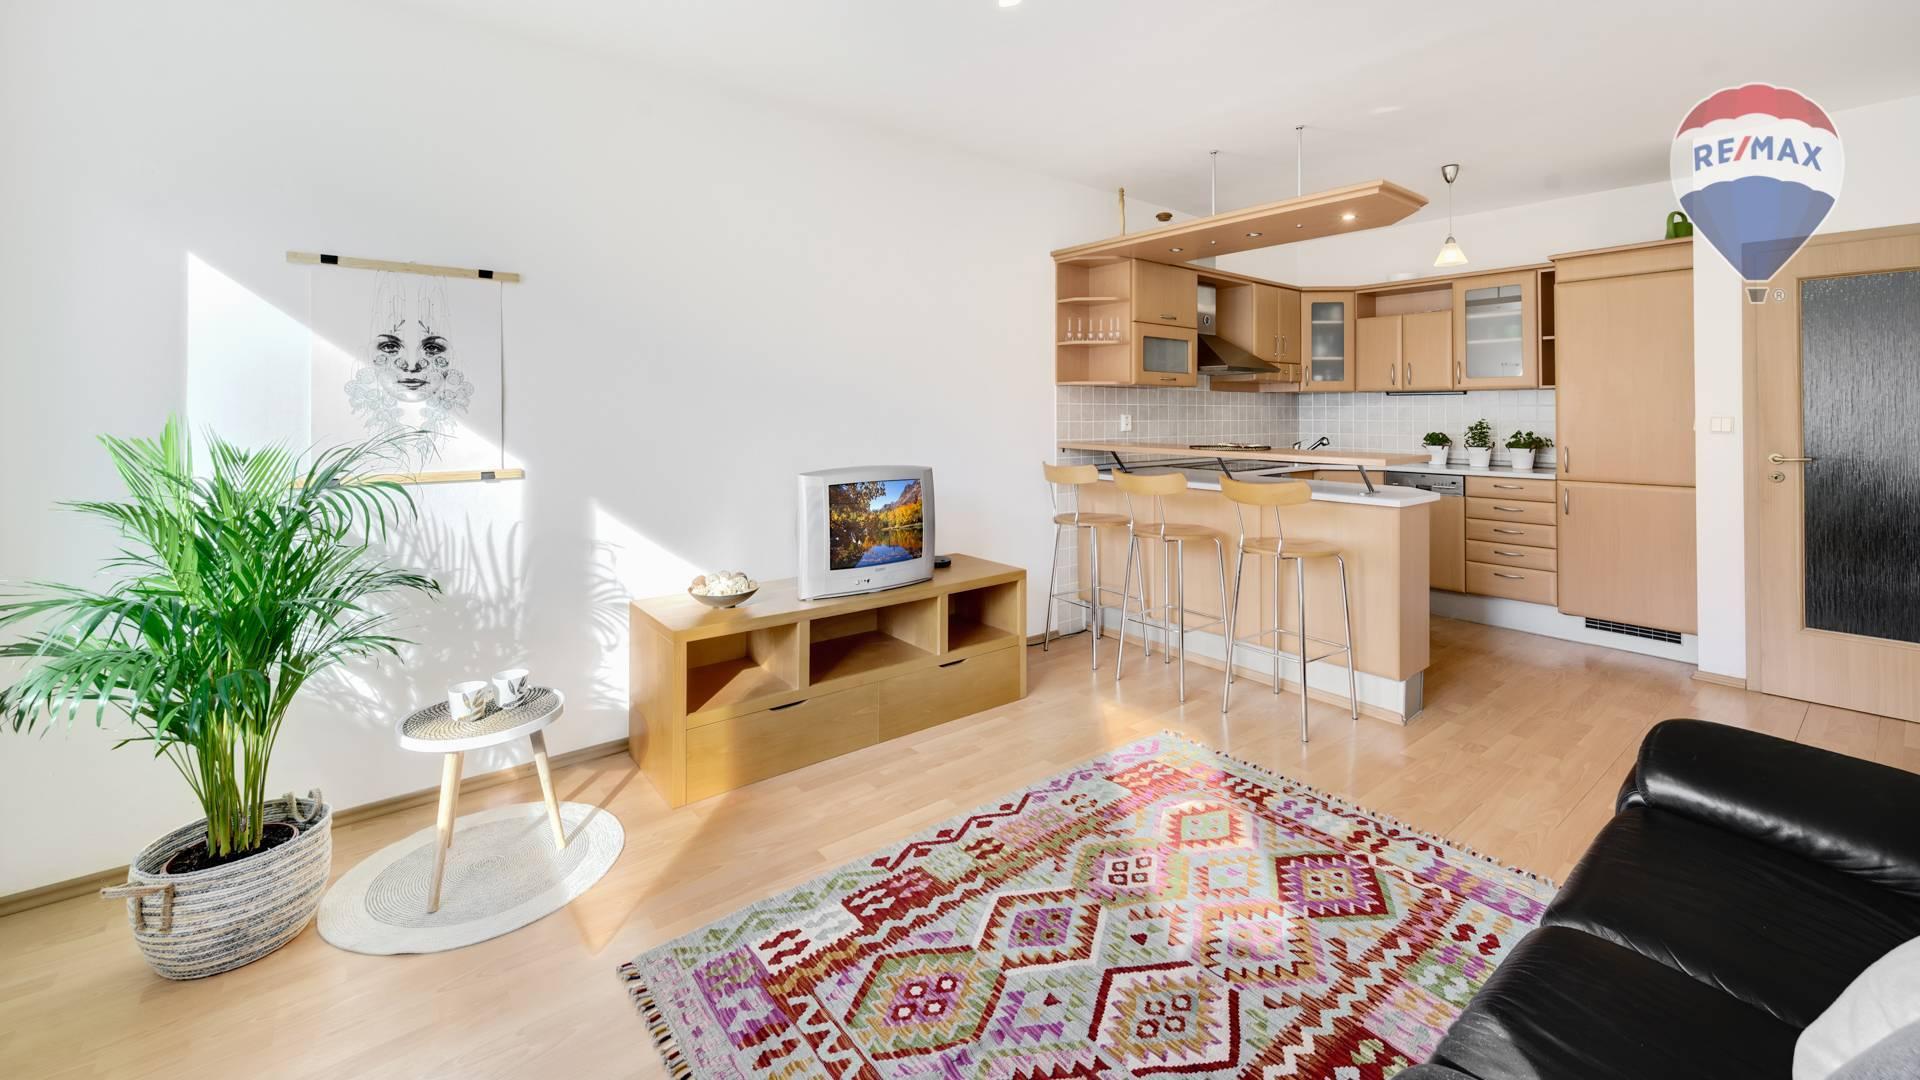 Predaj bytu (2 izbový) 58 m2, Bratislava - Ružinov -